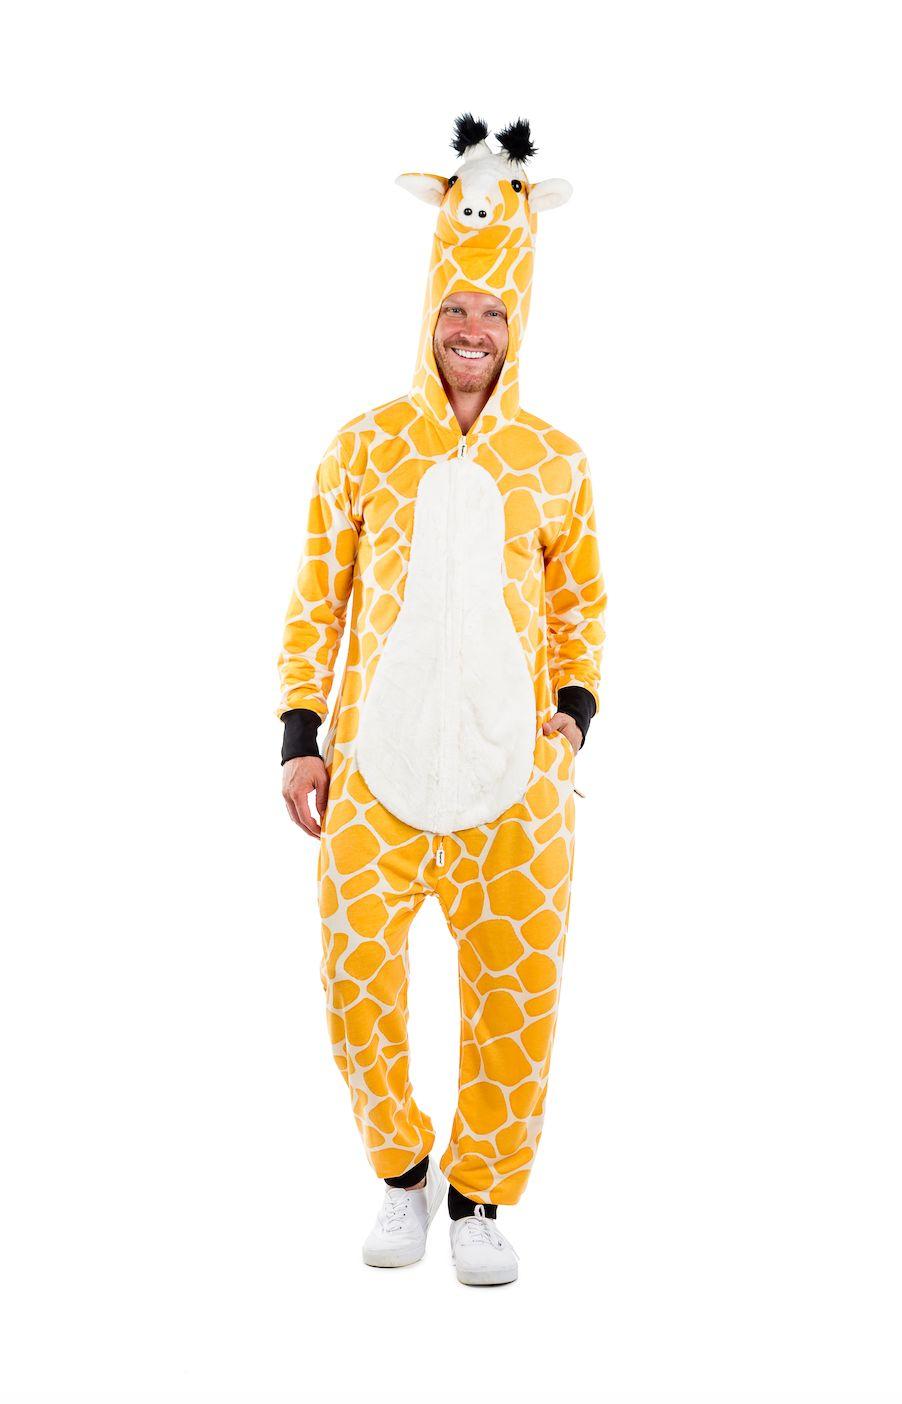 "Finding a weirder animal costume than this <a href=""https://www.tipsyelves.com/mens-giraffe-costume"" target=""_blank"">giraffe"